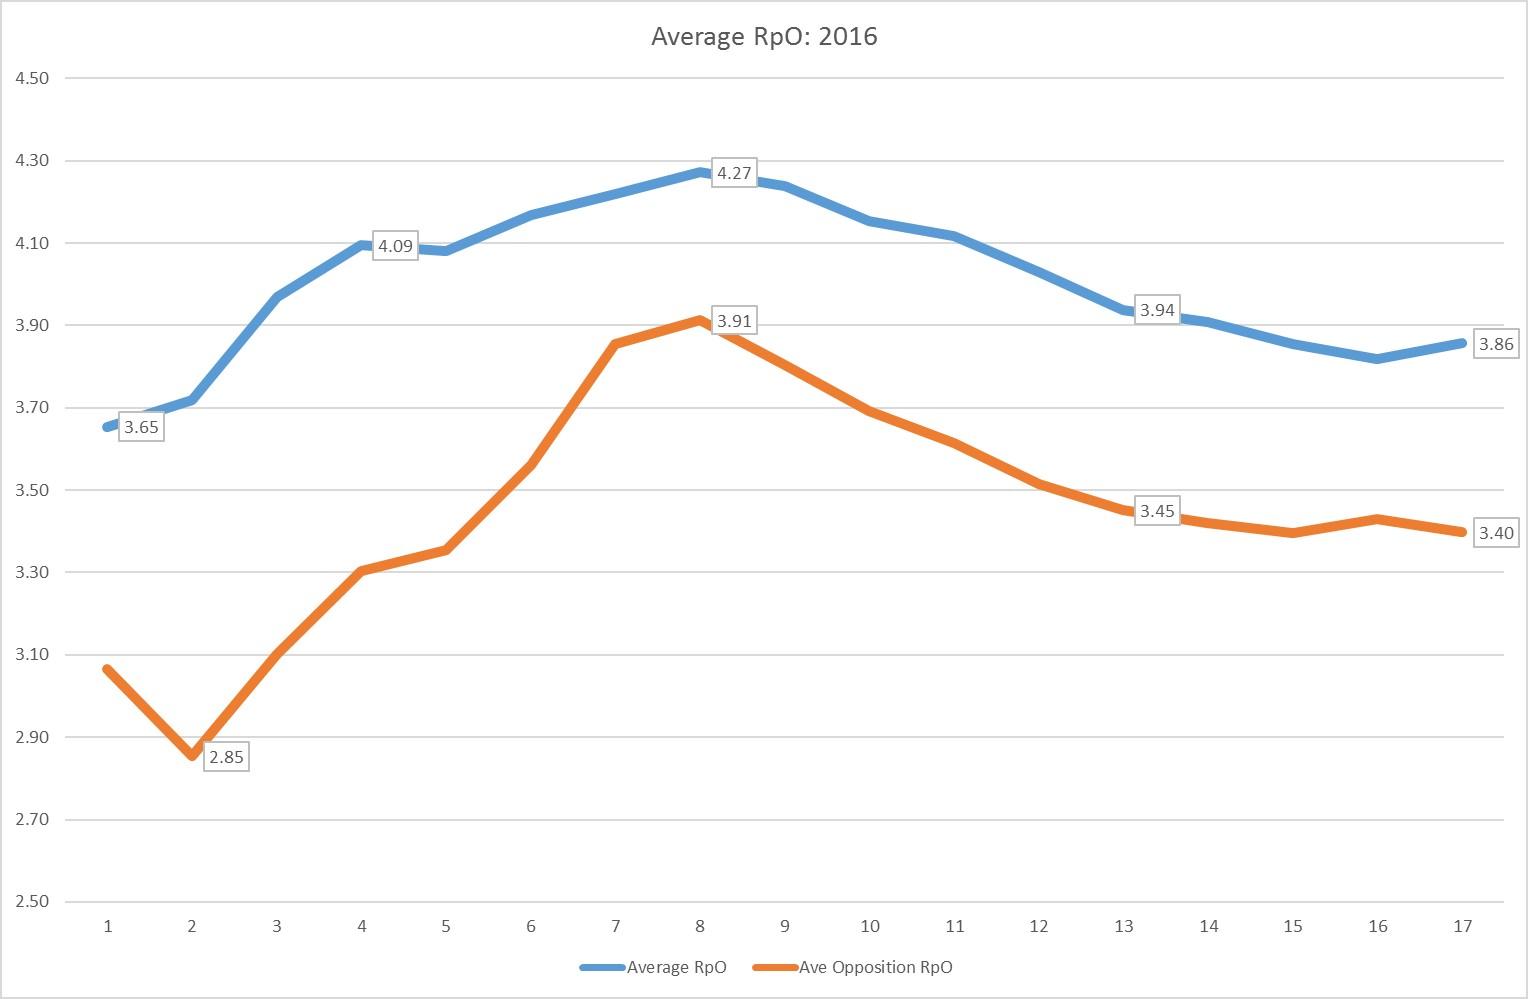 Average RpO over the 2016 season